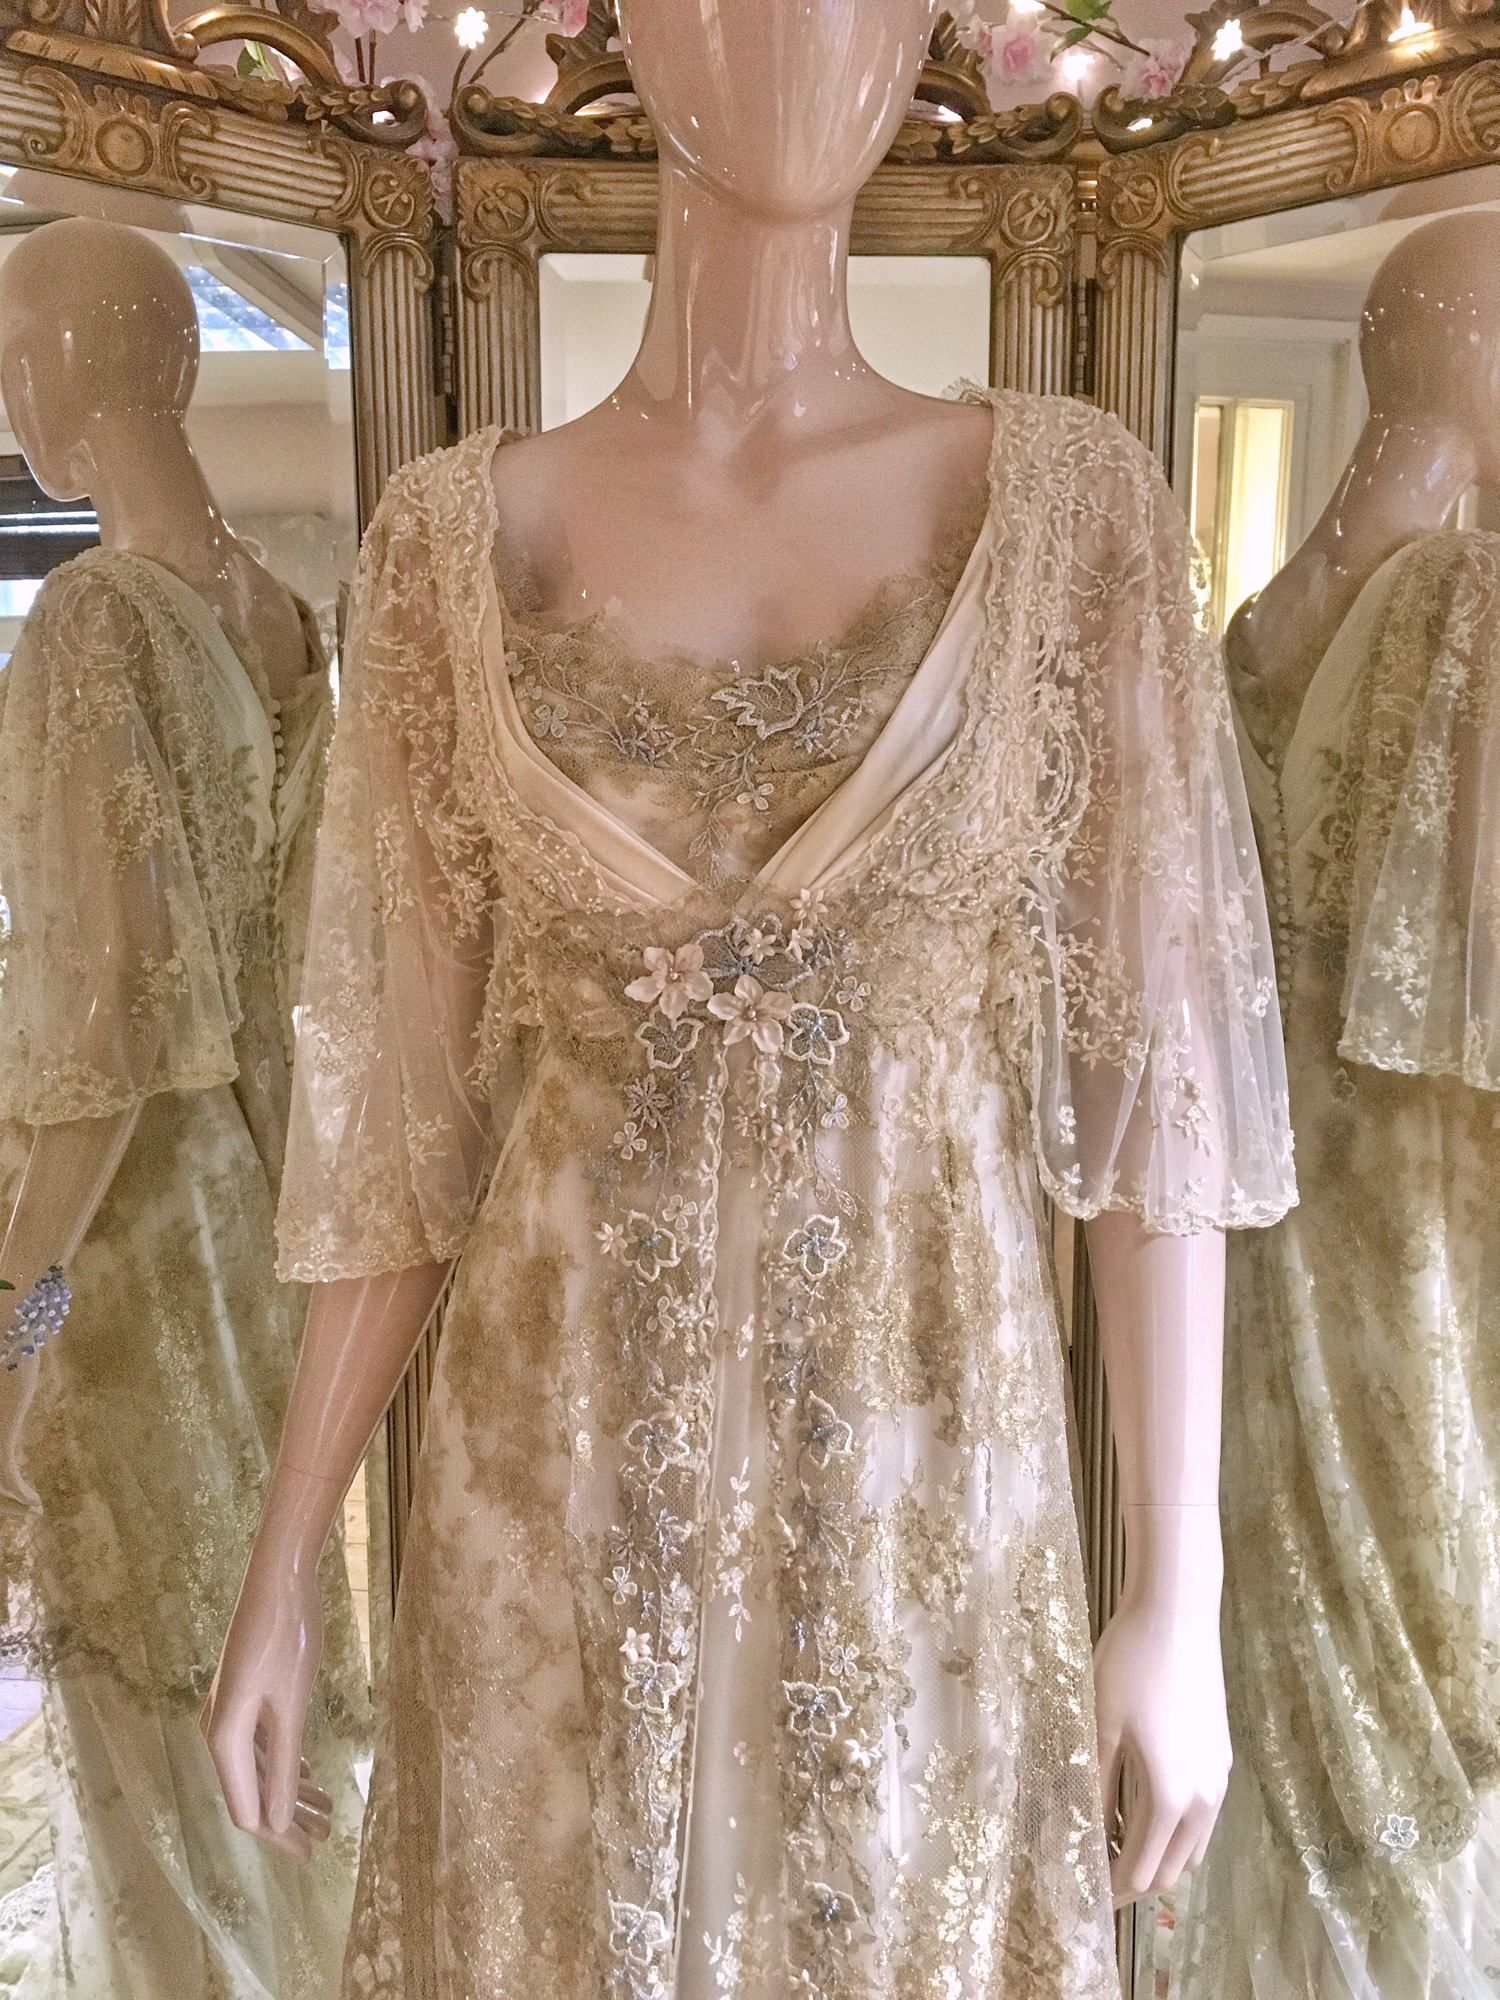 Pale gold cream silk edwardian inspired wedding dress